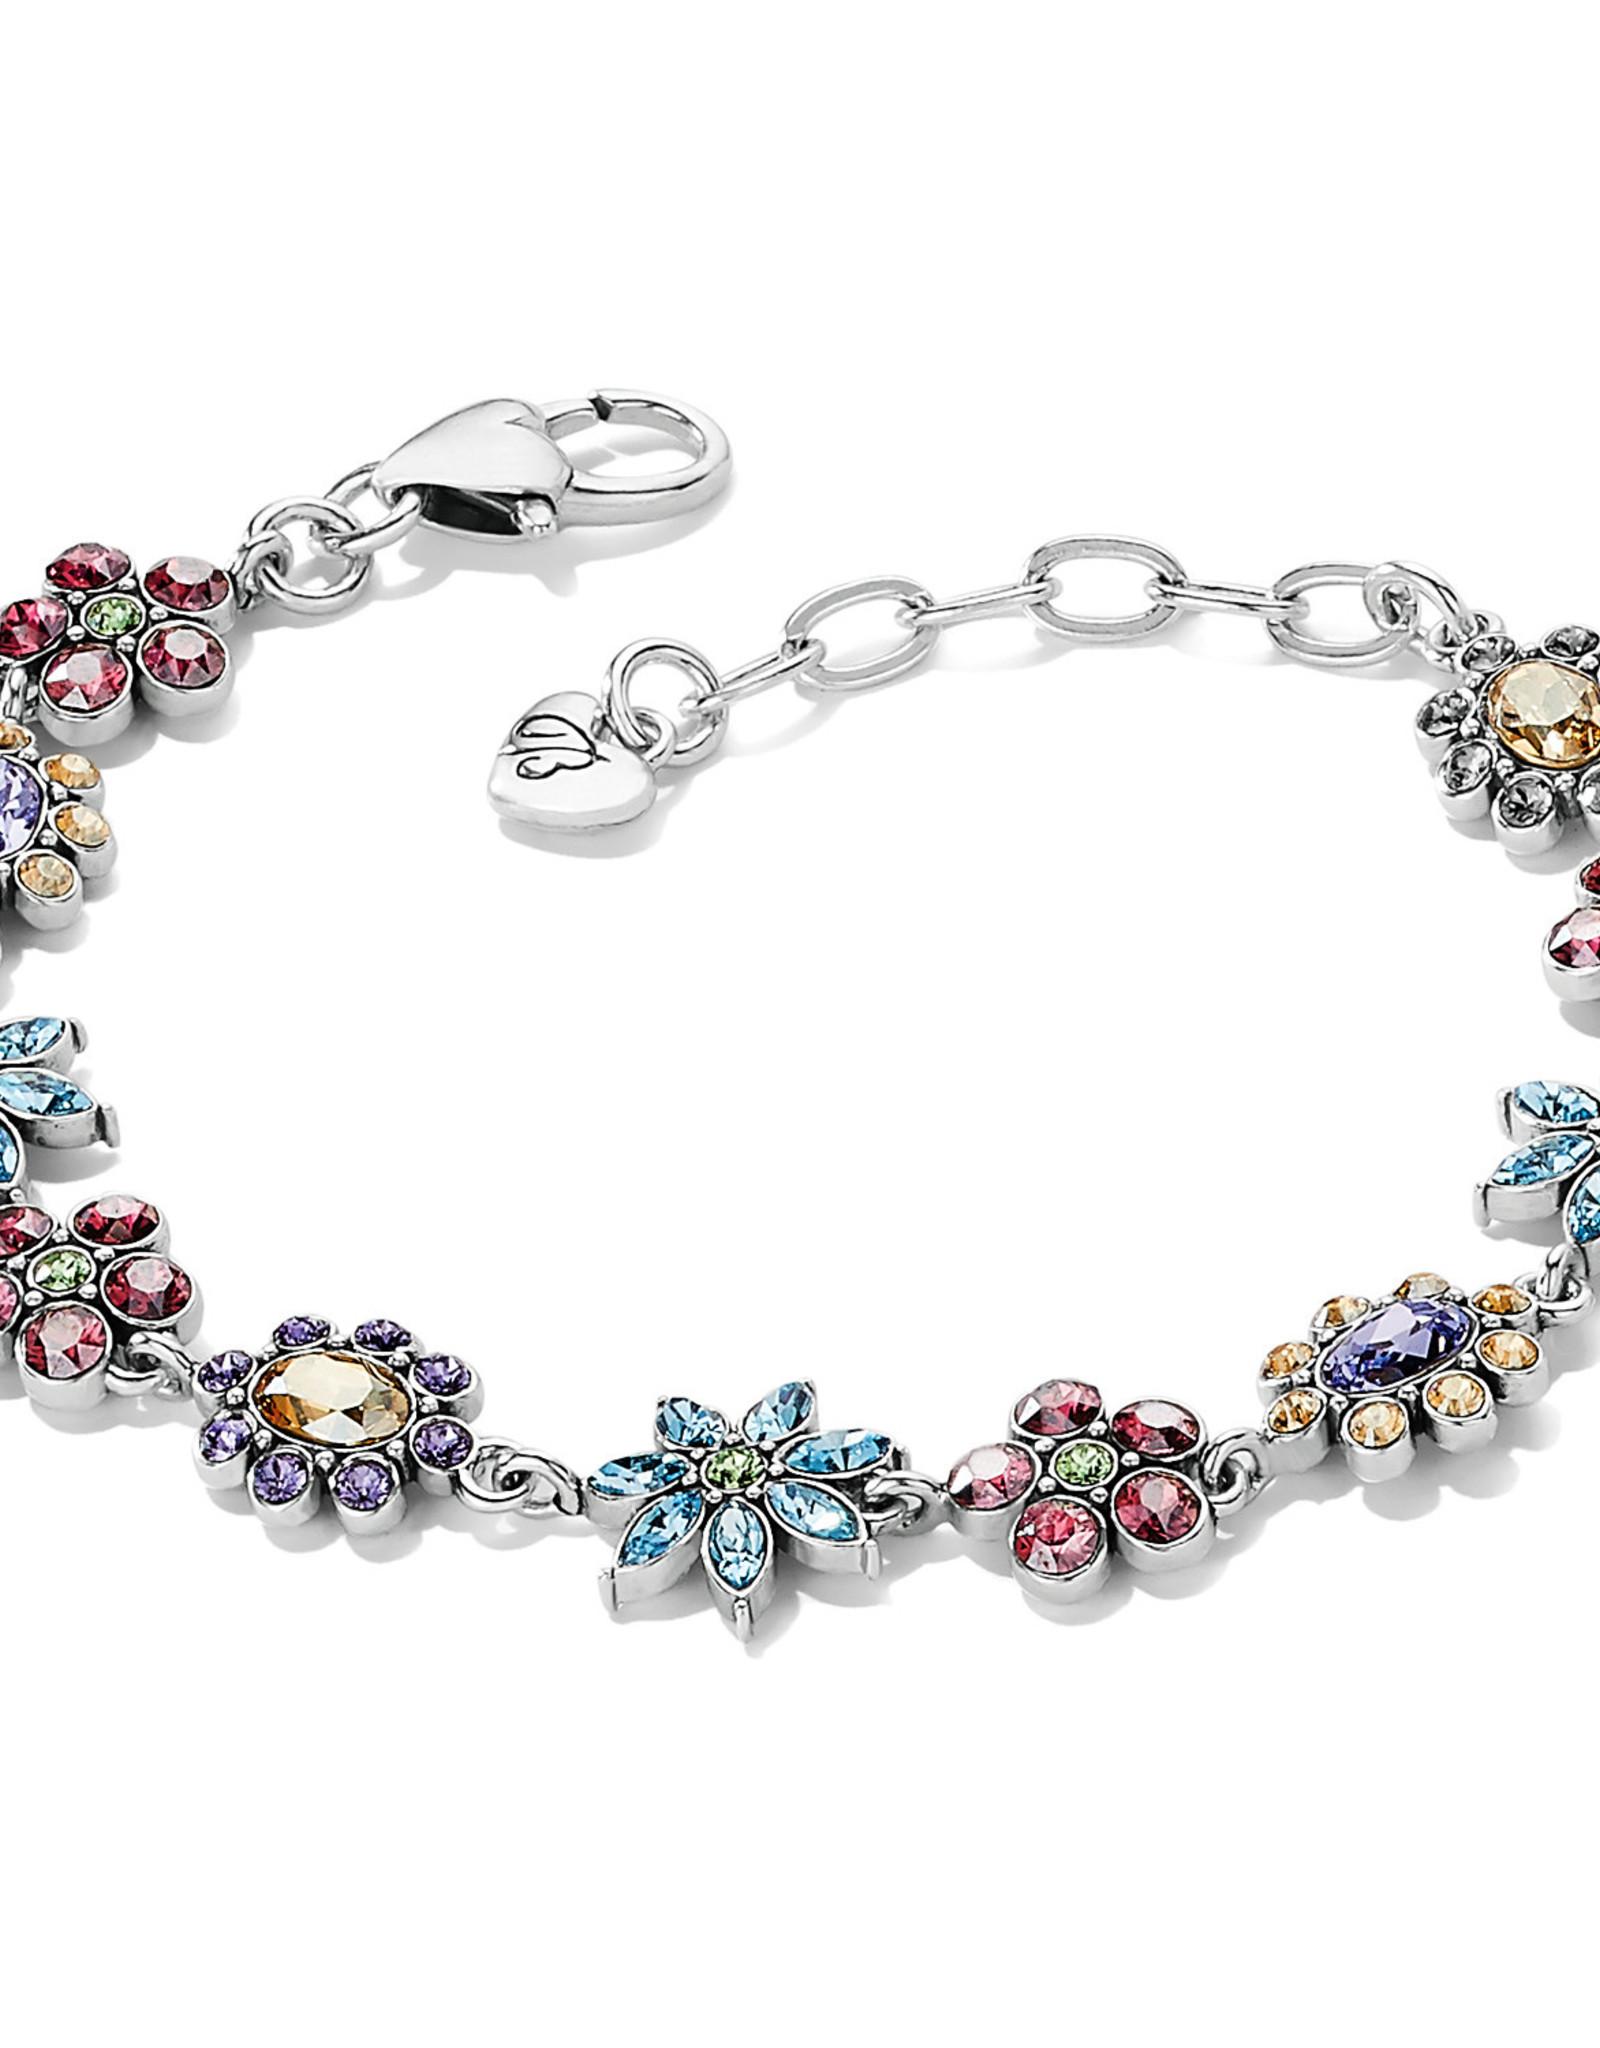 Brighton Brighton Bracelet Trust Your Journey Garden  Silver-Rose-Blue